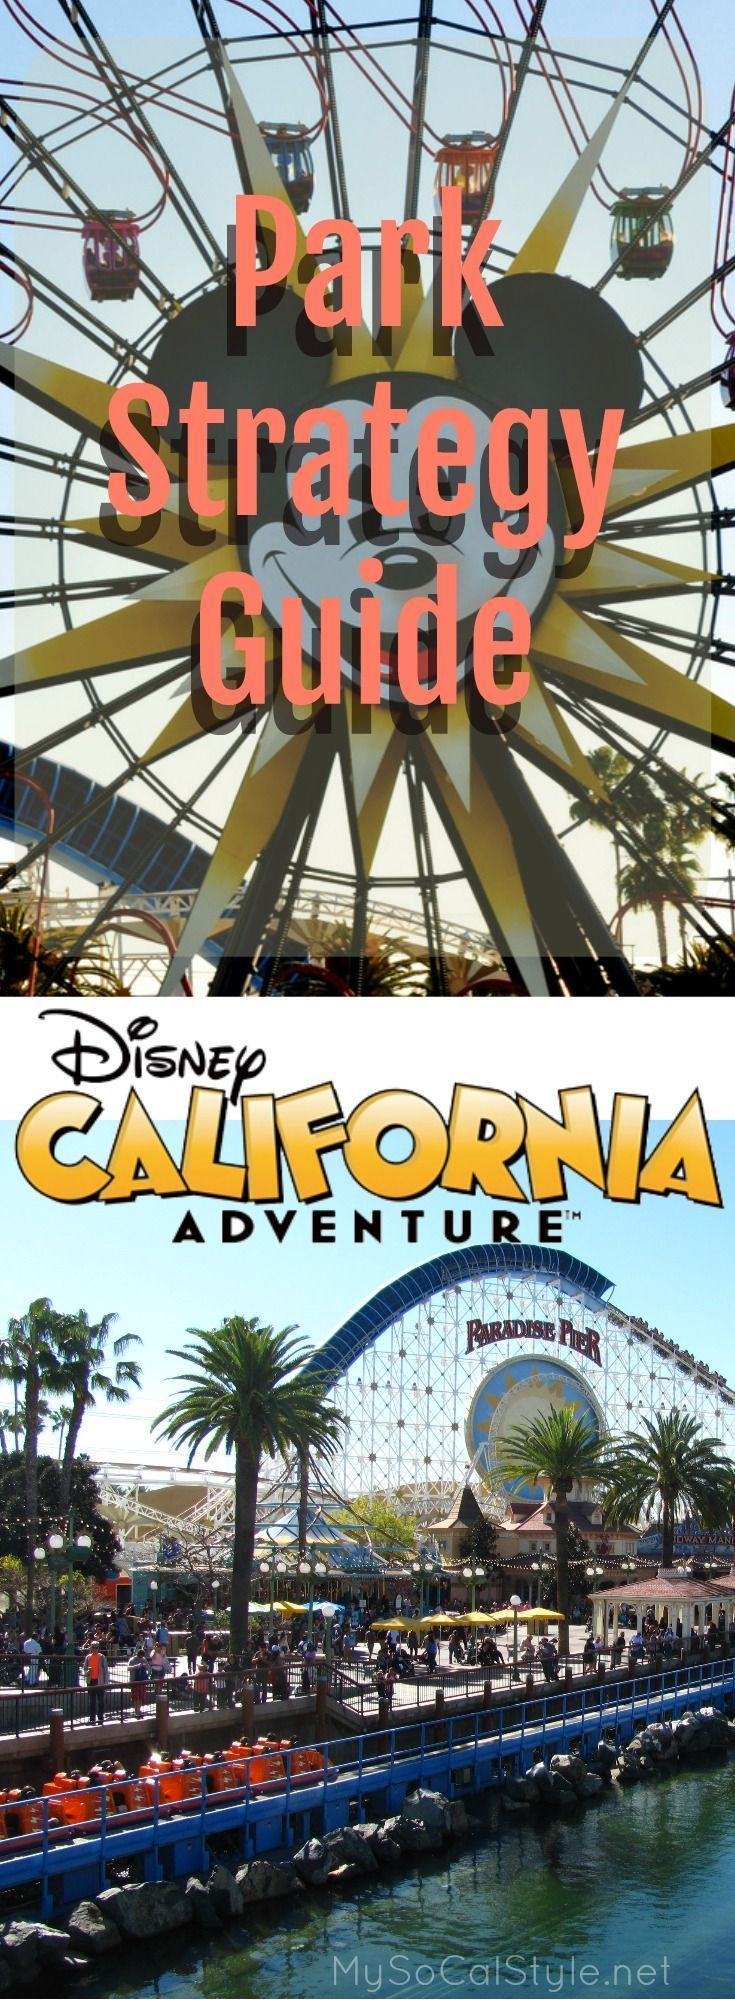 The best strategies for Disneyland's California Adventure Park! | #Disneyland | #CaliforniaAdventure | #DCA | #Disney |